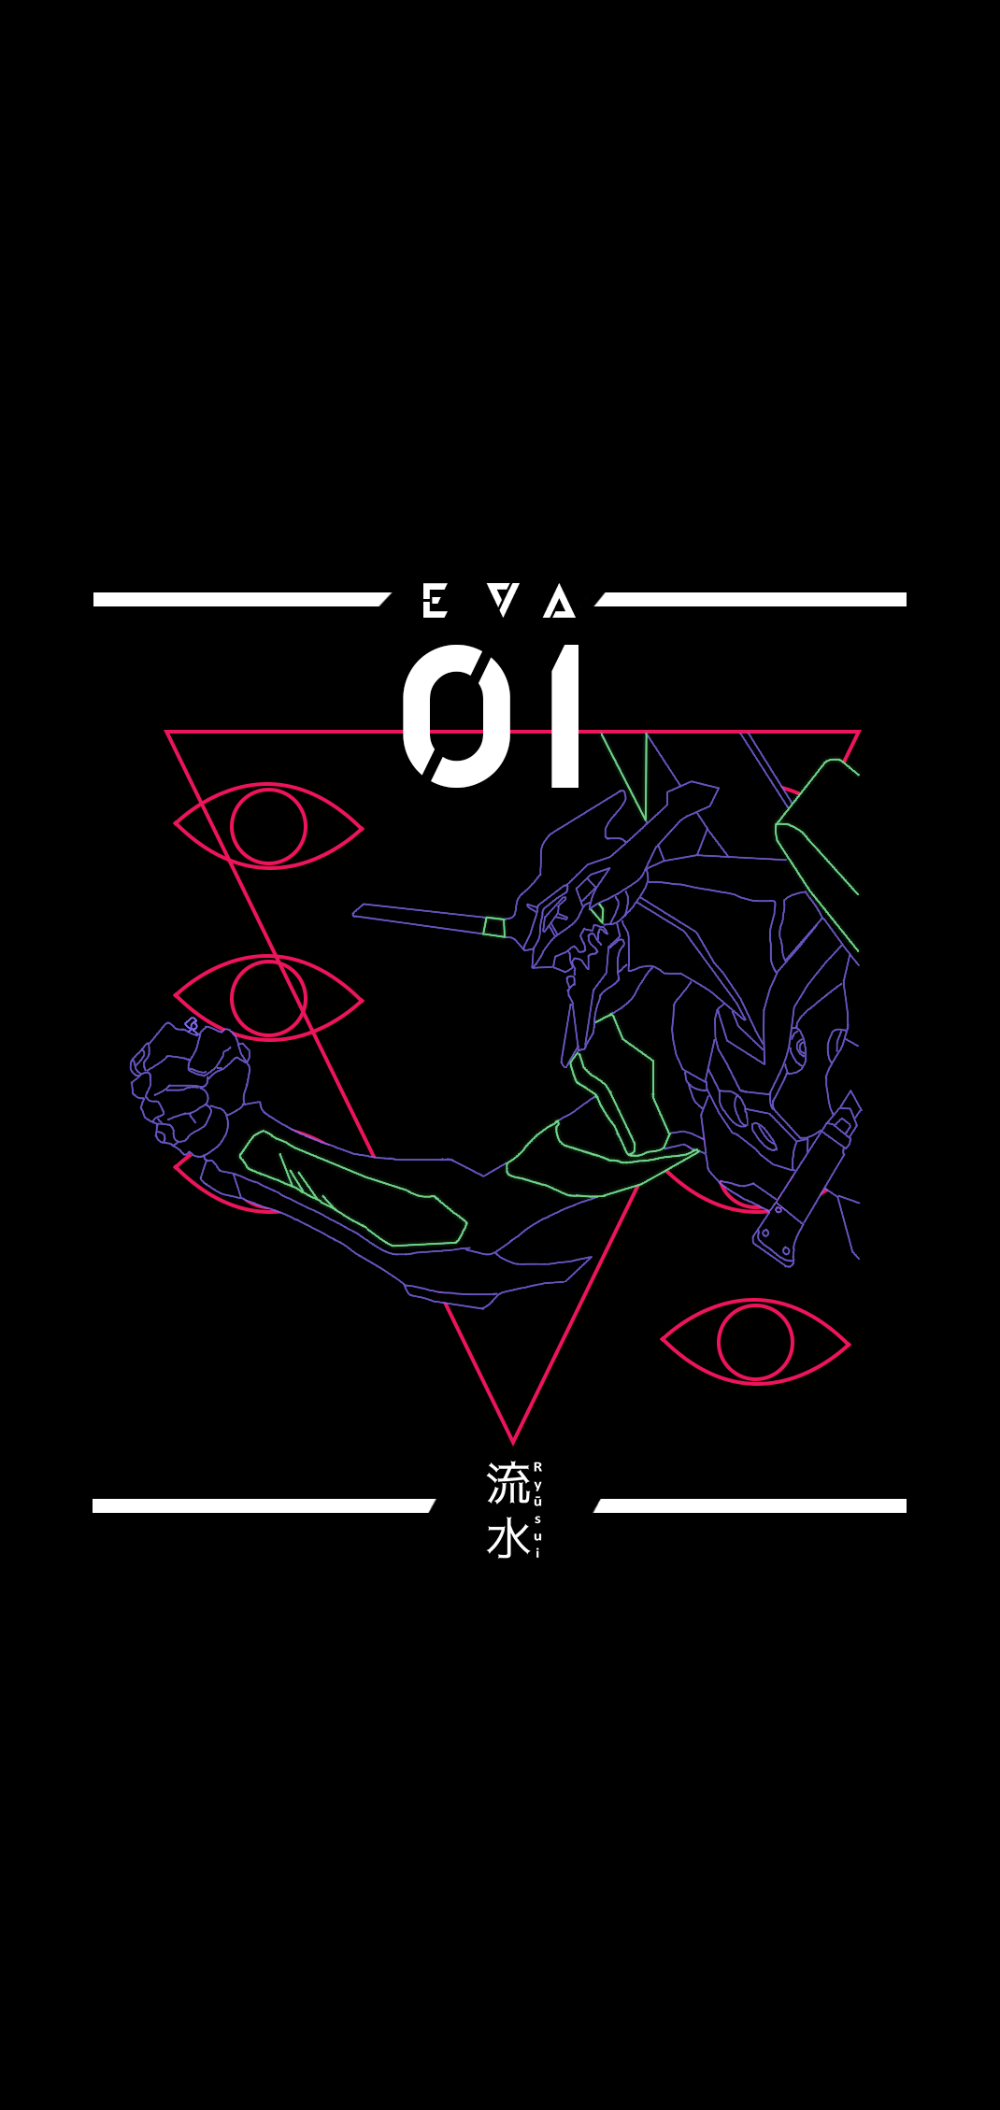 Made A Evangelion Wallpaper Hope You Guys Like It Evangelion Neon Evangelion Neon Genesis Evangelion Evangelion